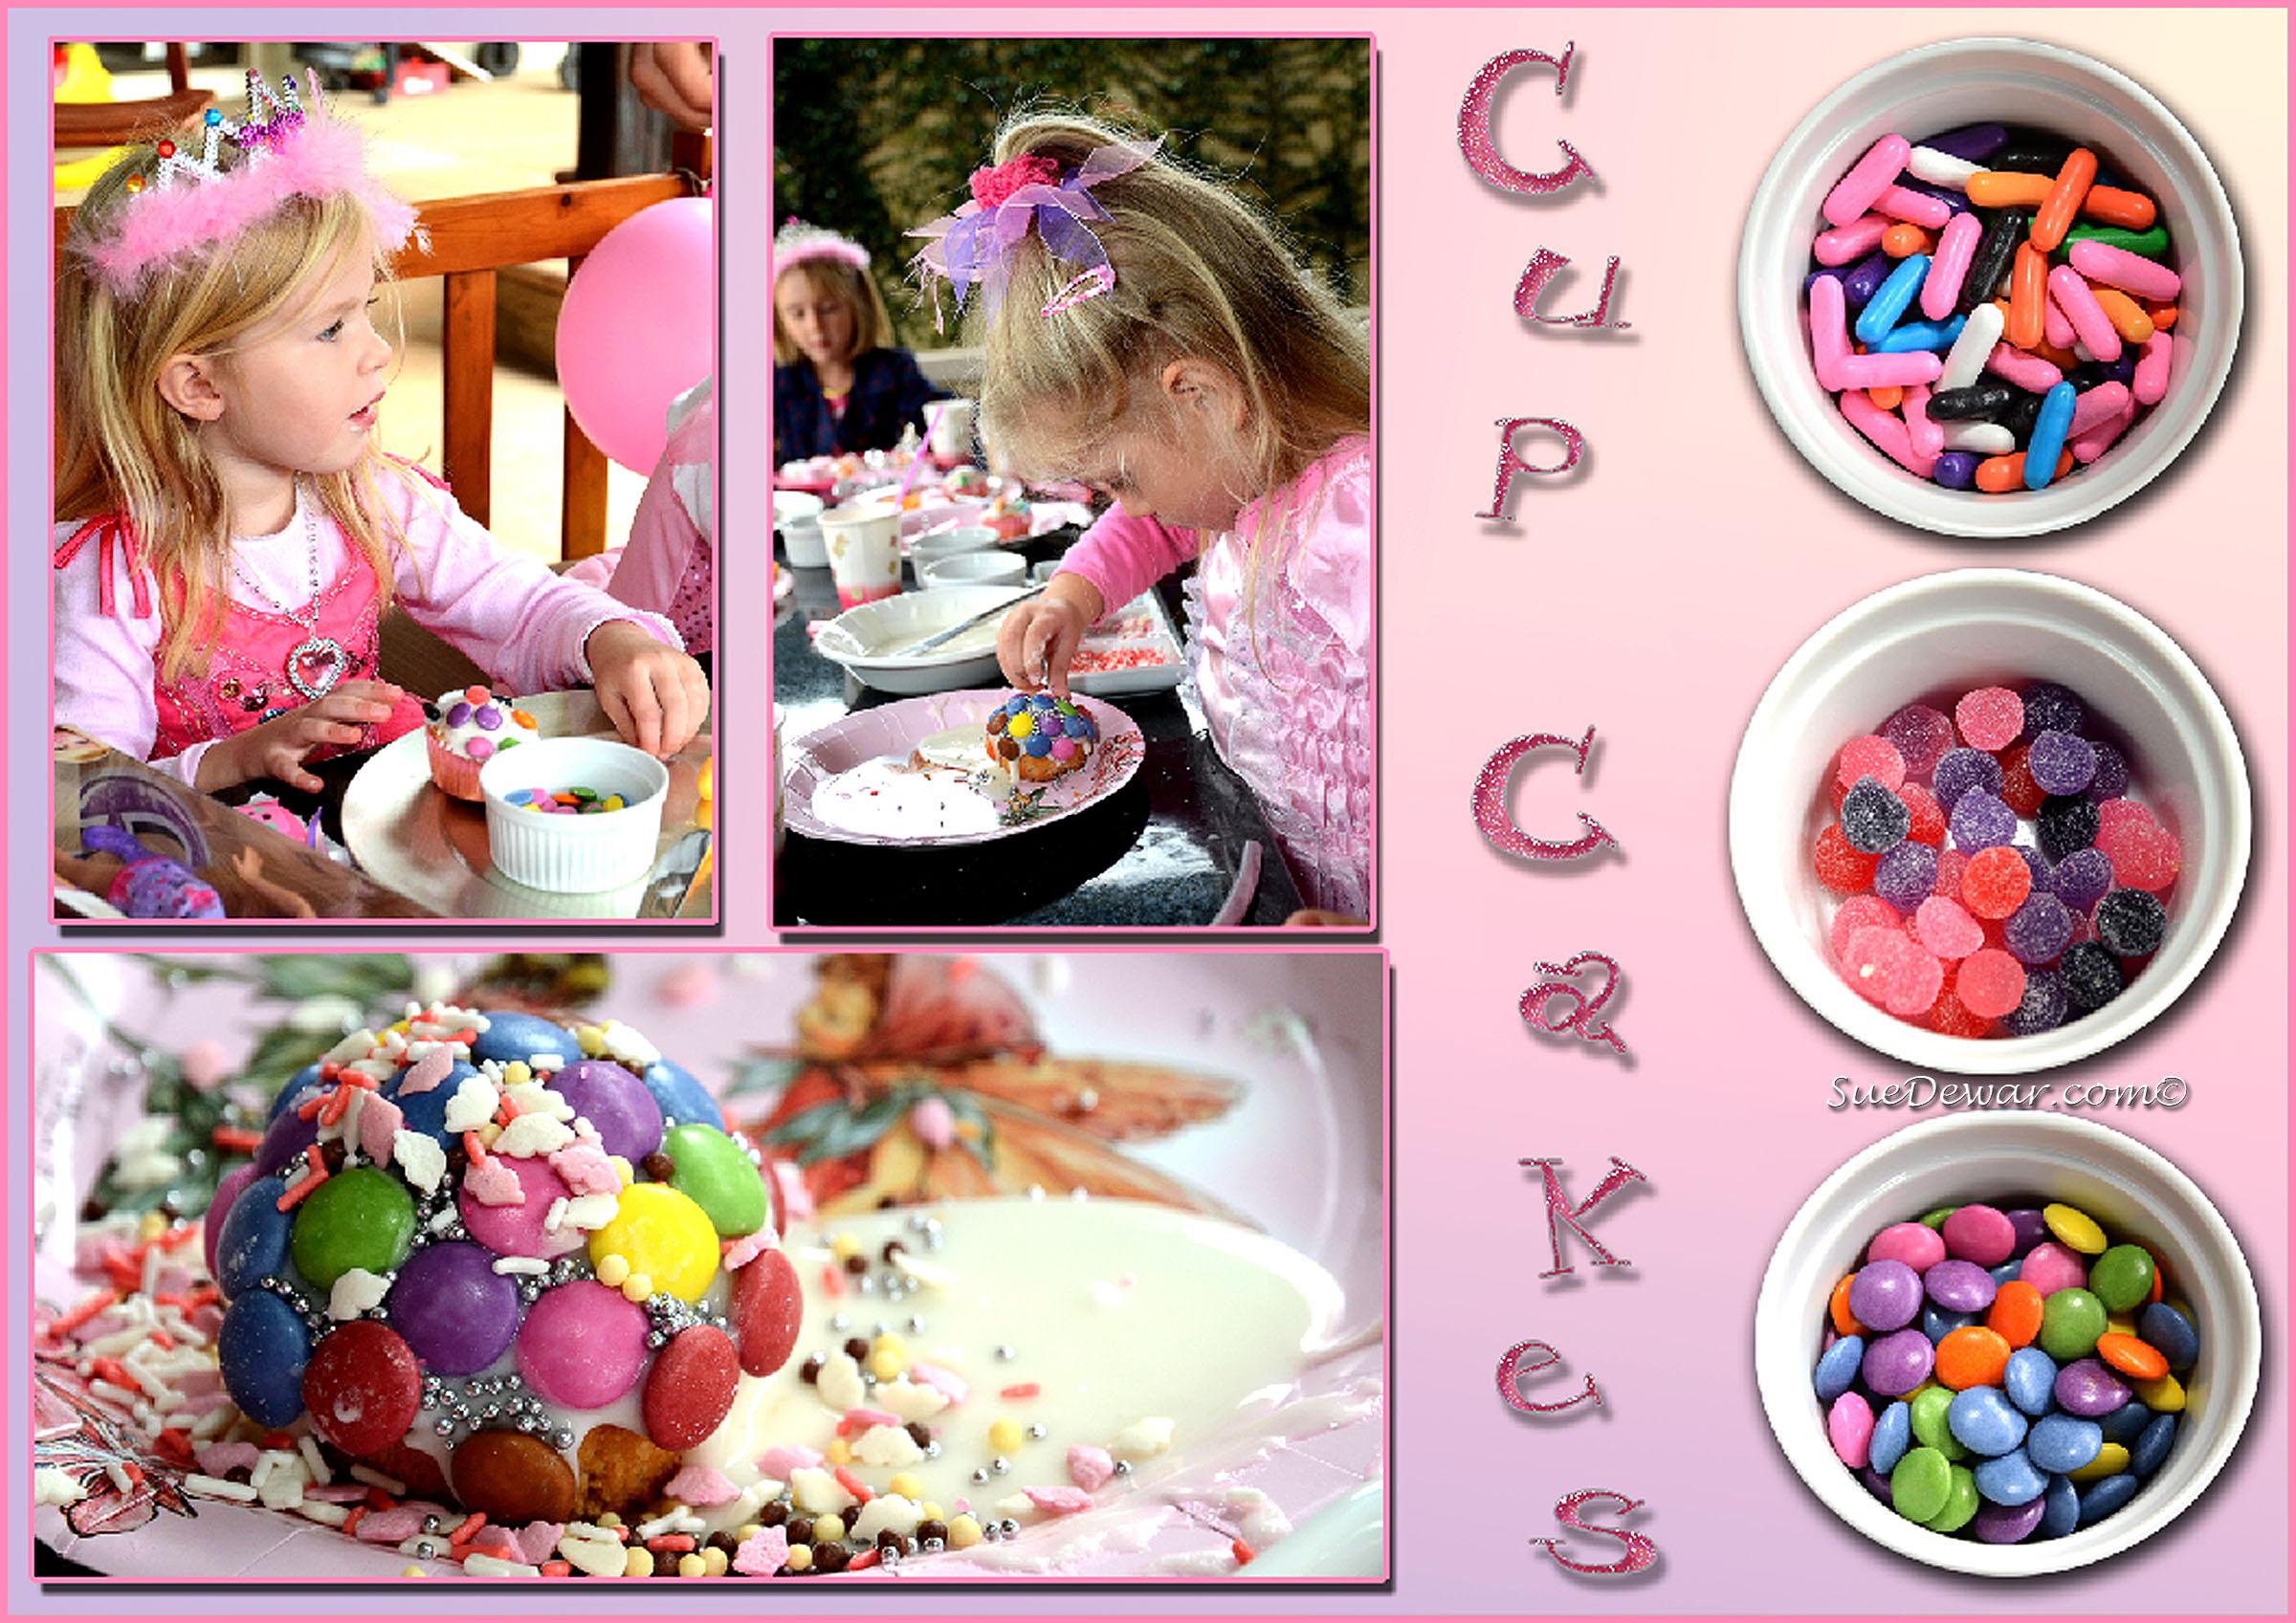 SueDewar_Family_Portraits_Childrens_Parties2